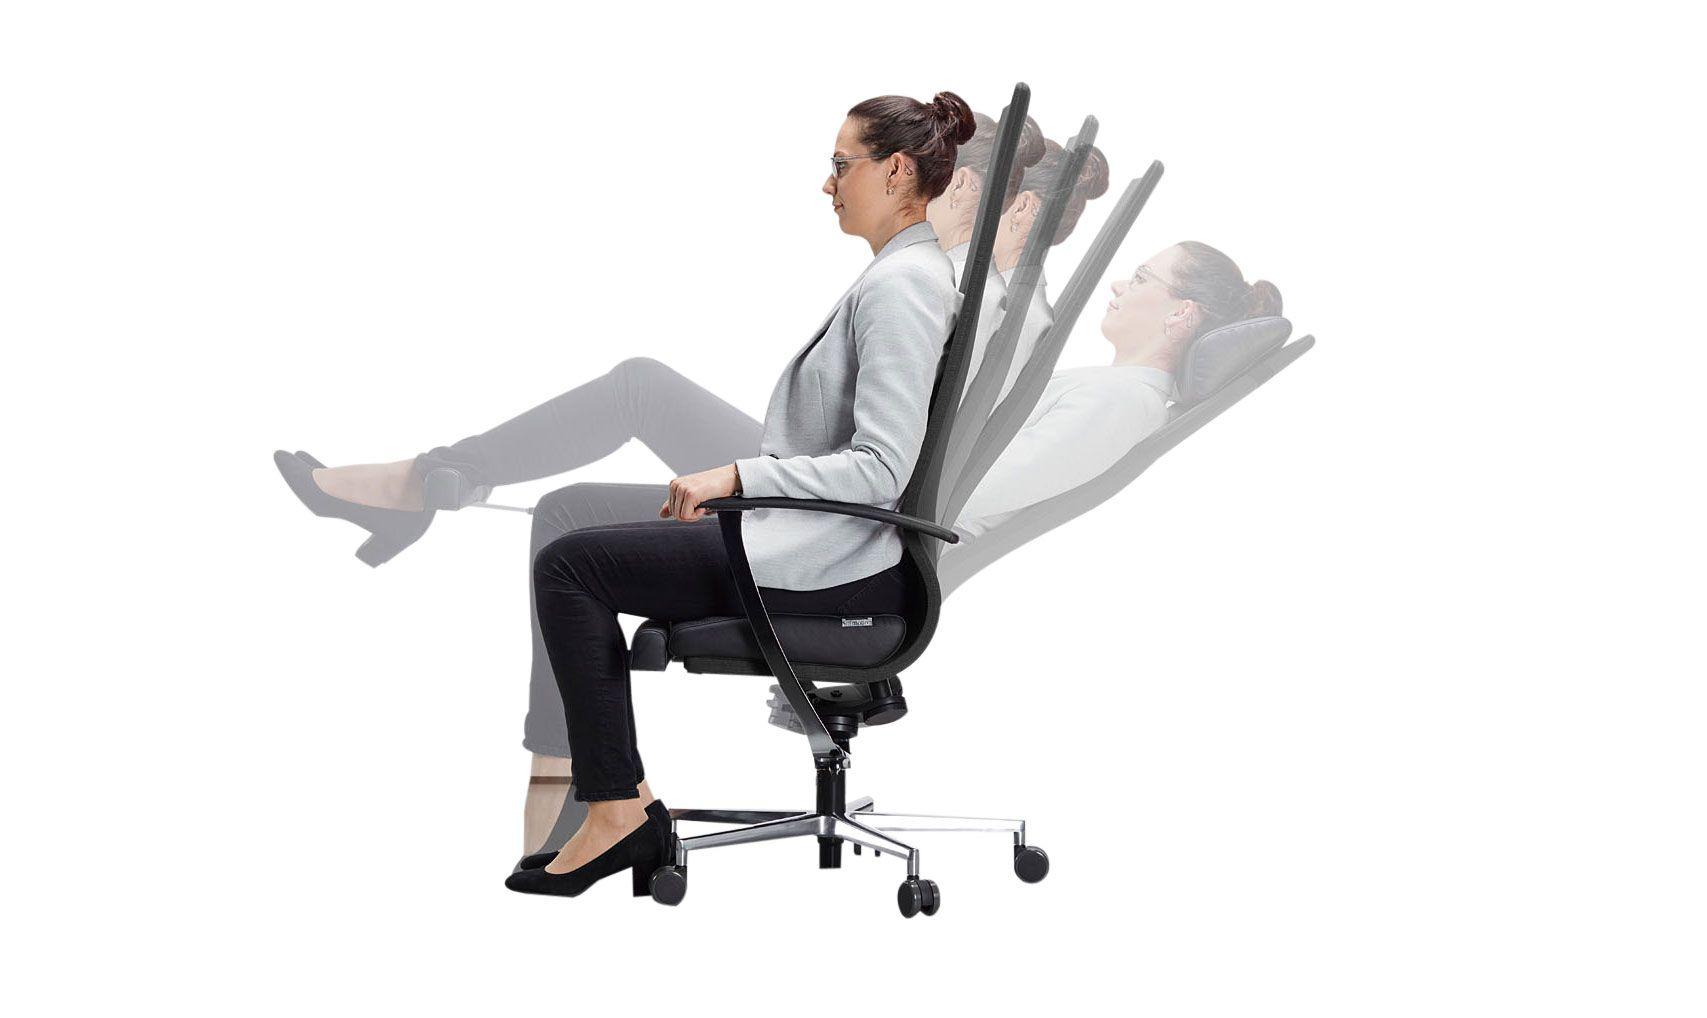 Gesundes Sitzen Im Büro